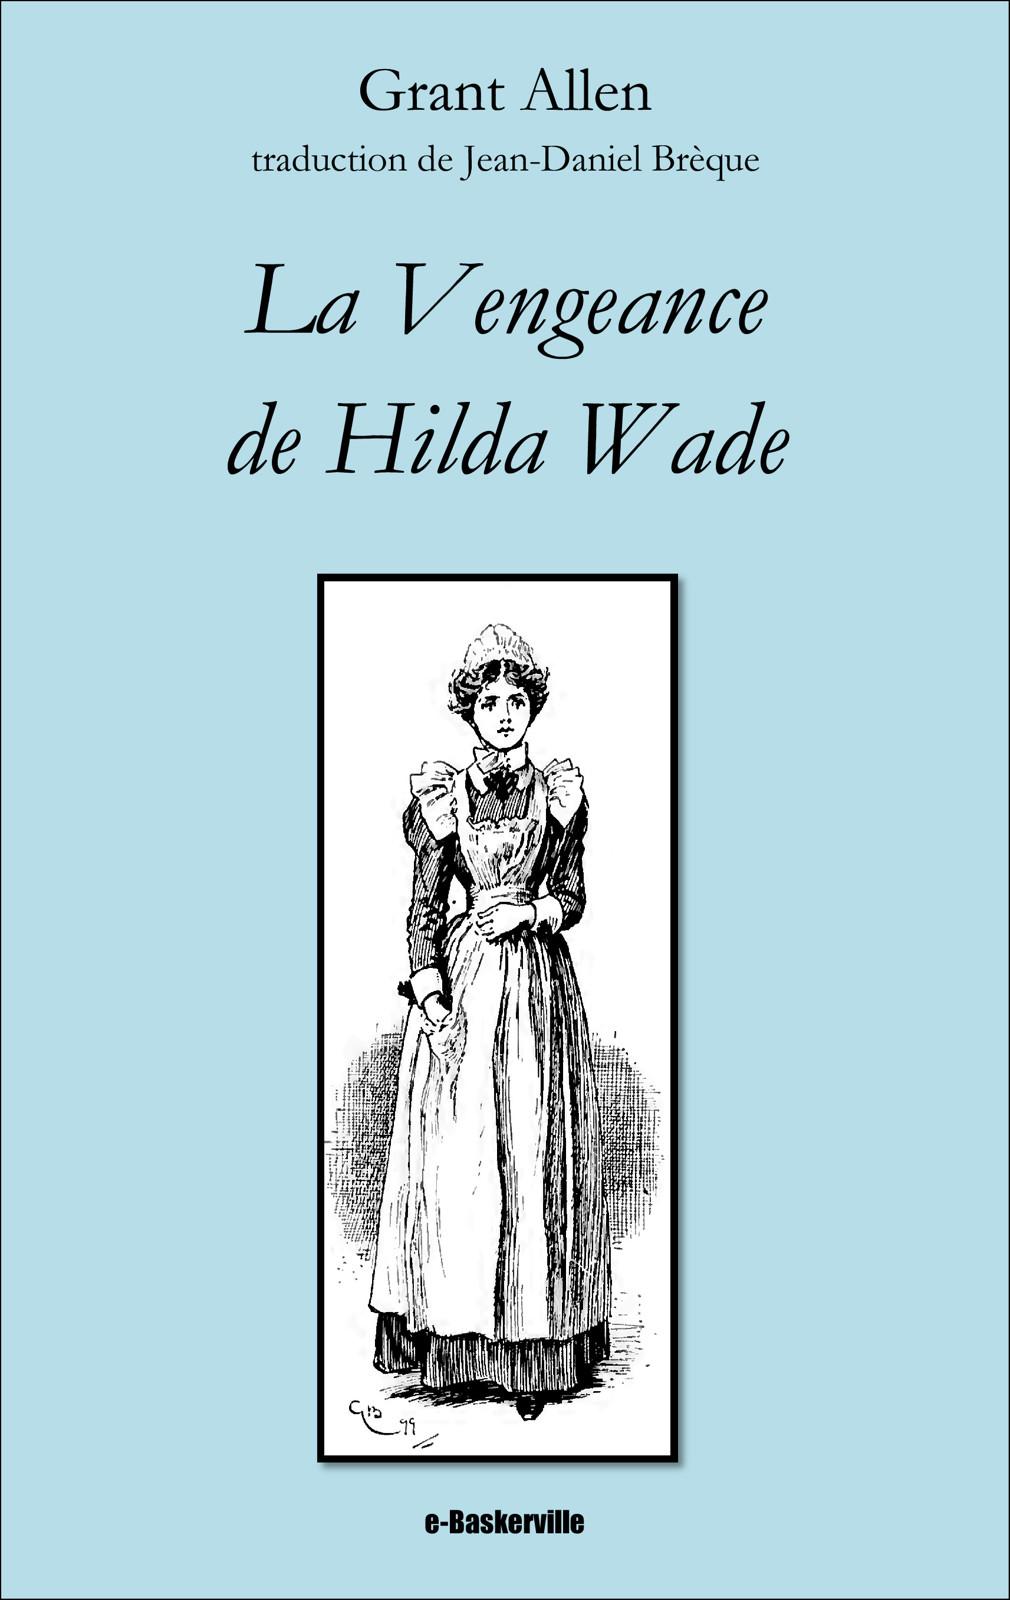 La Vengeance de Hilda Wade